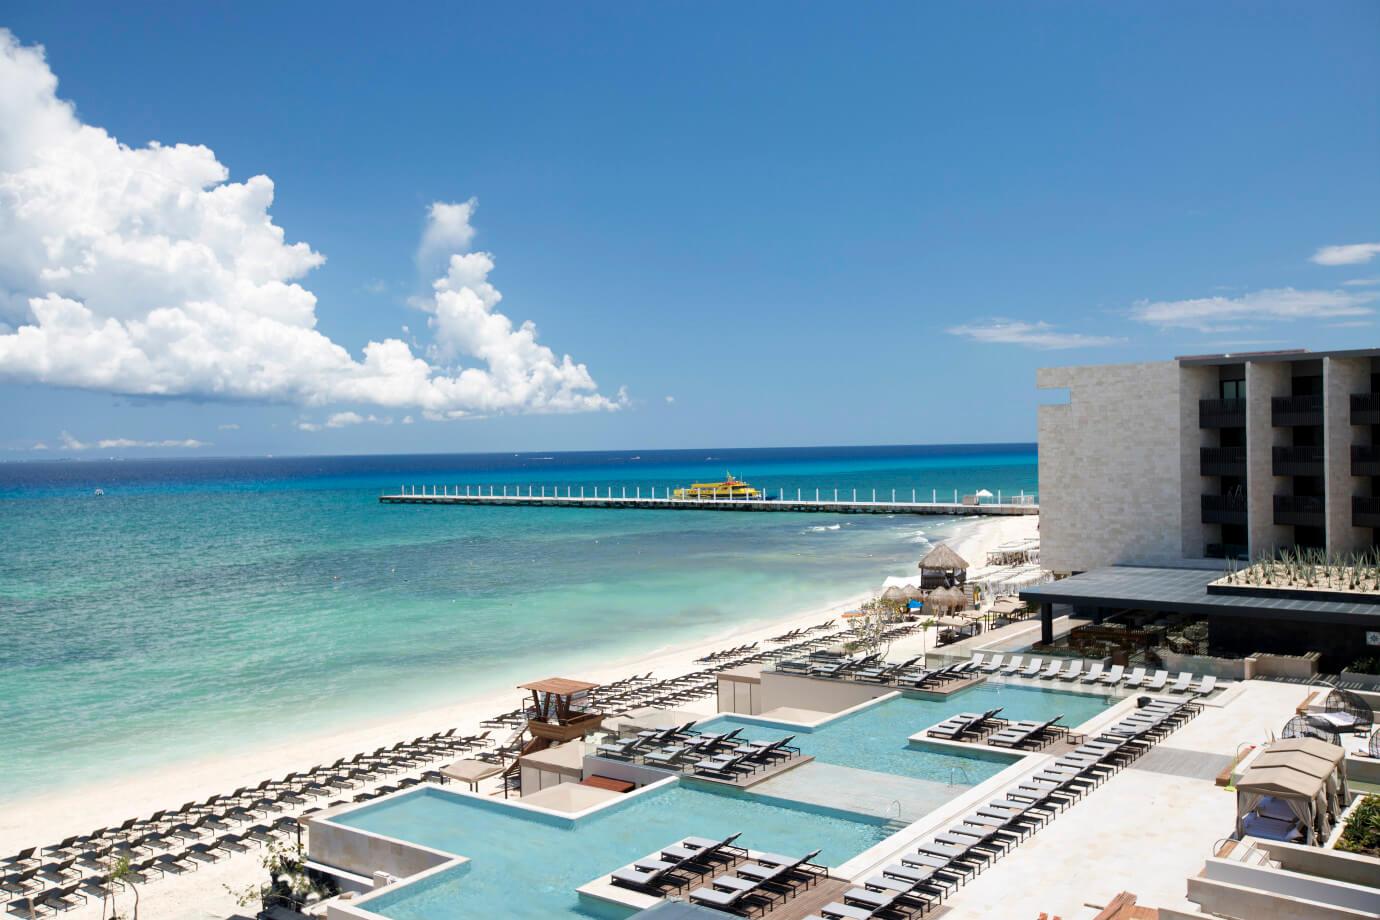 Grand Hyatt Playa Del Carmen Resort Save Up To 20 Here